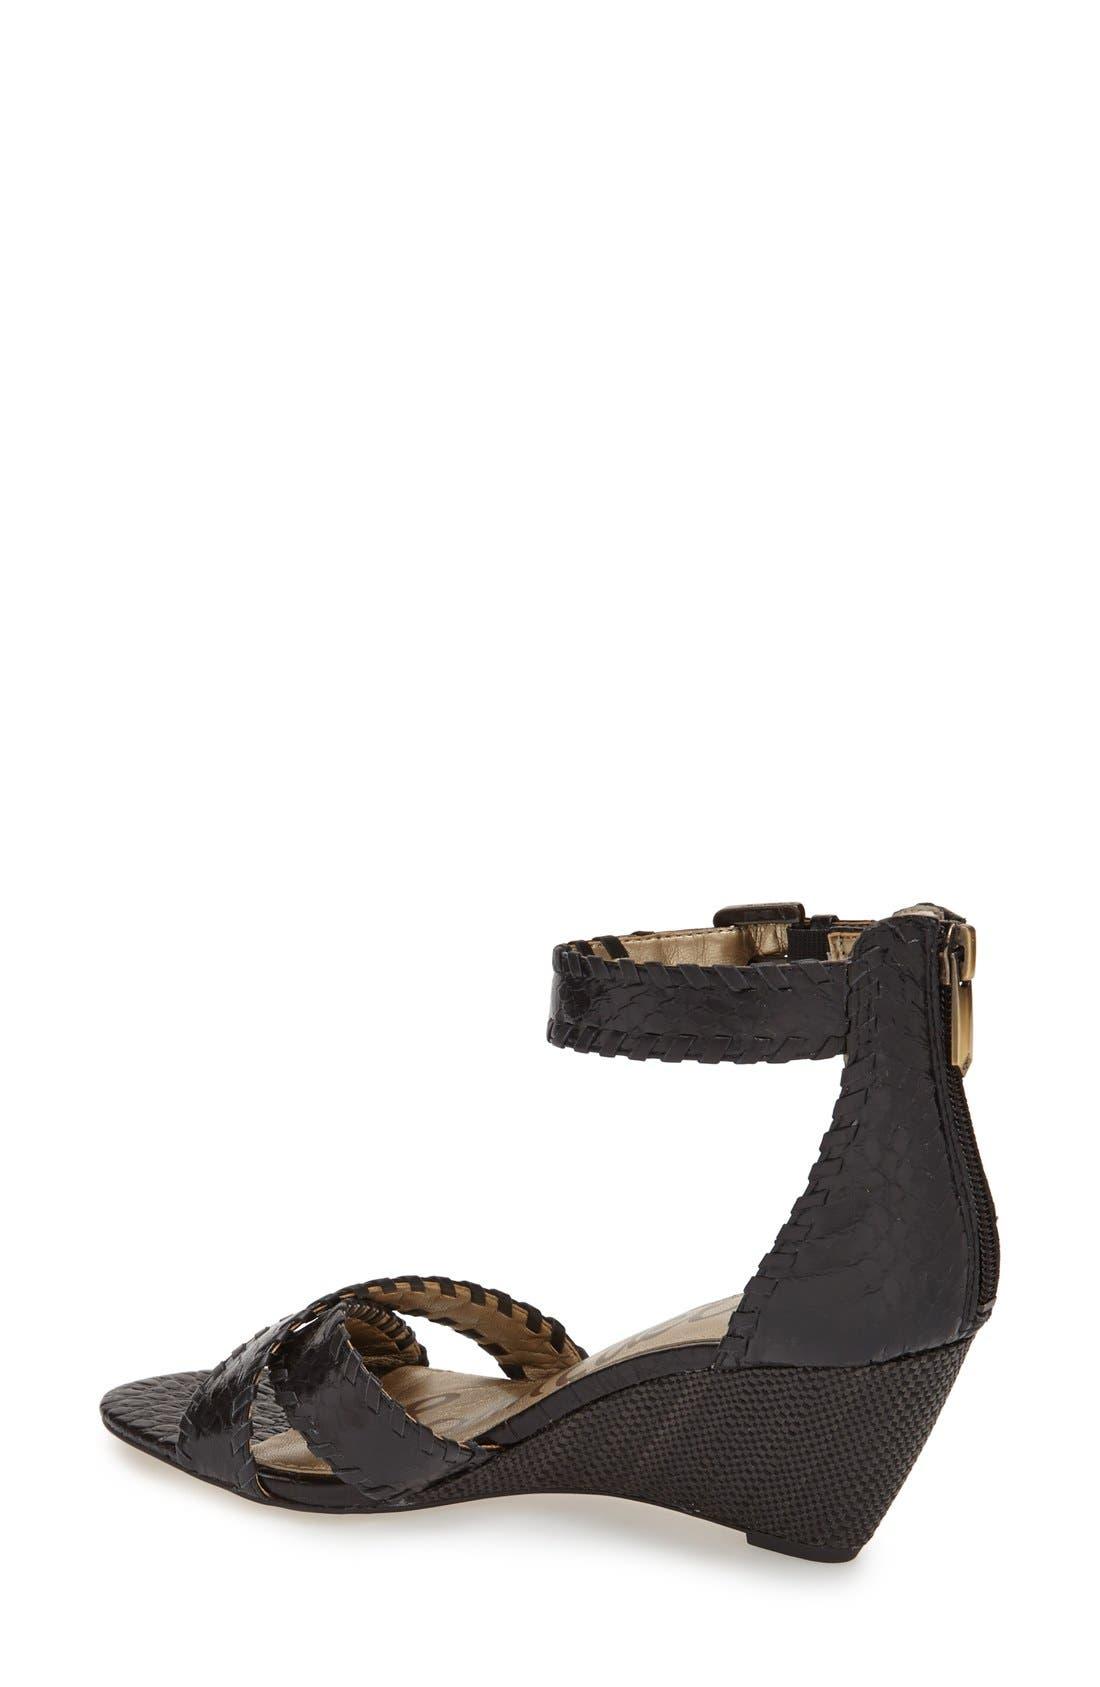 Alternate Image 2  - Sam Edelman 'Silvia' Ankle Strap Wedge Sandal (Women)